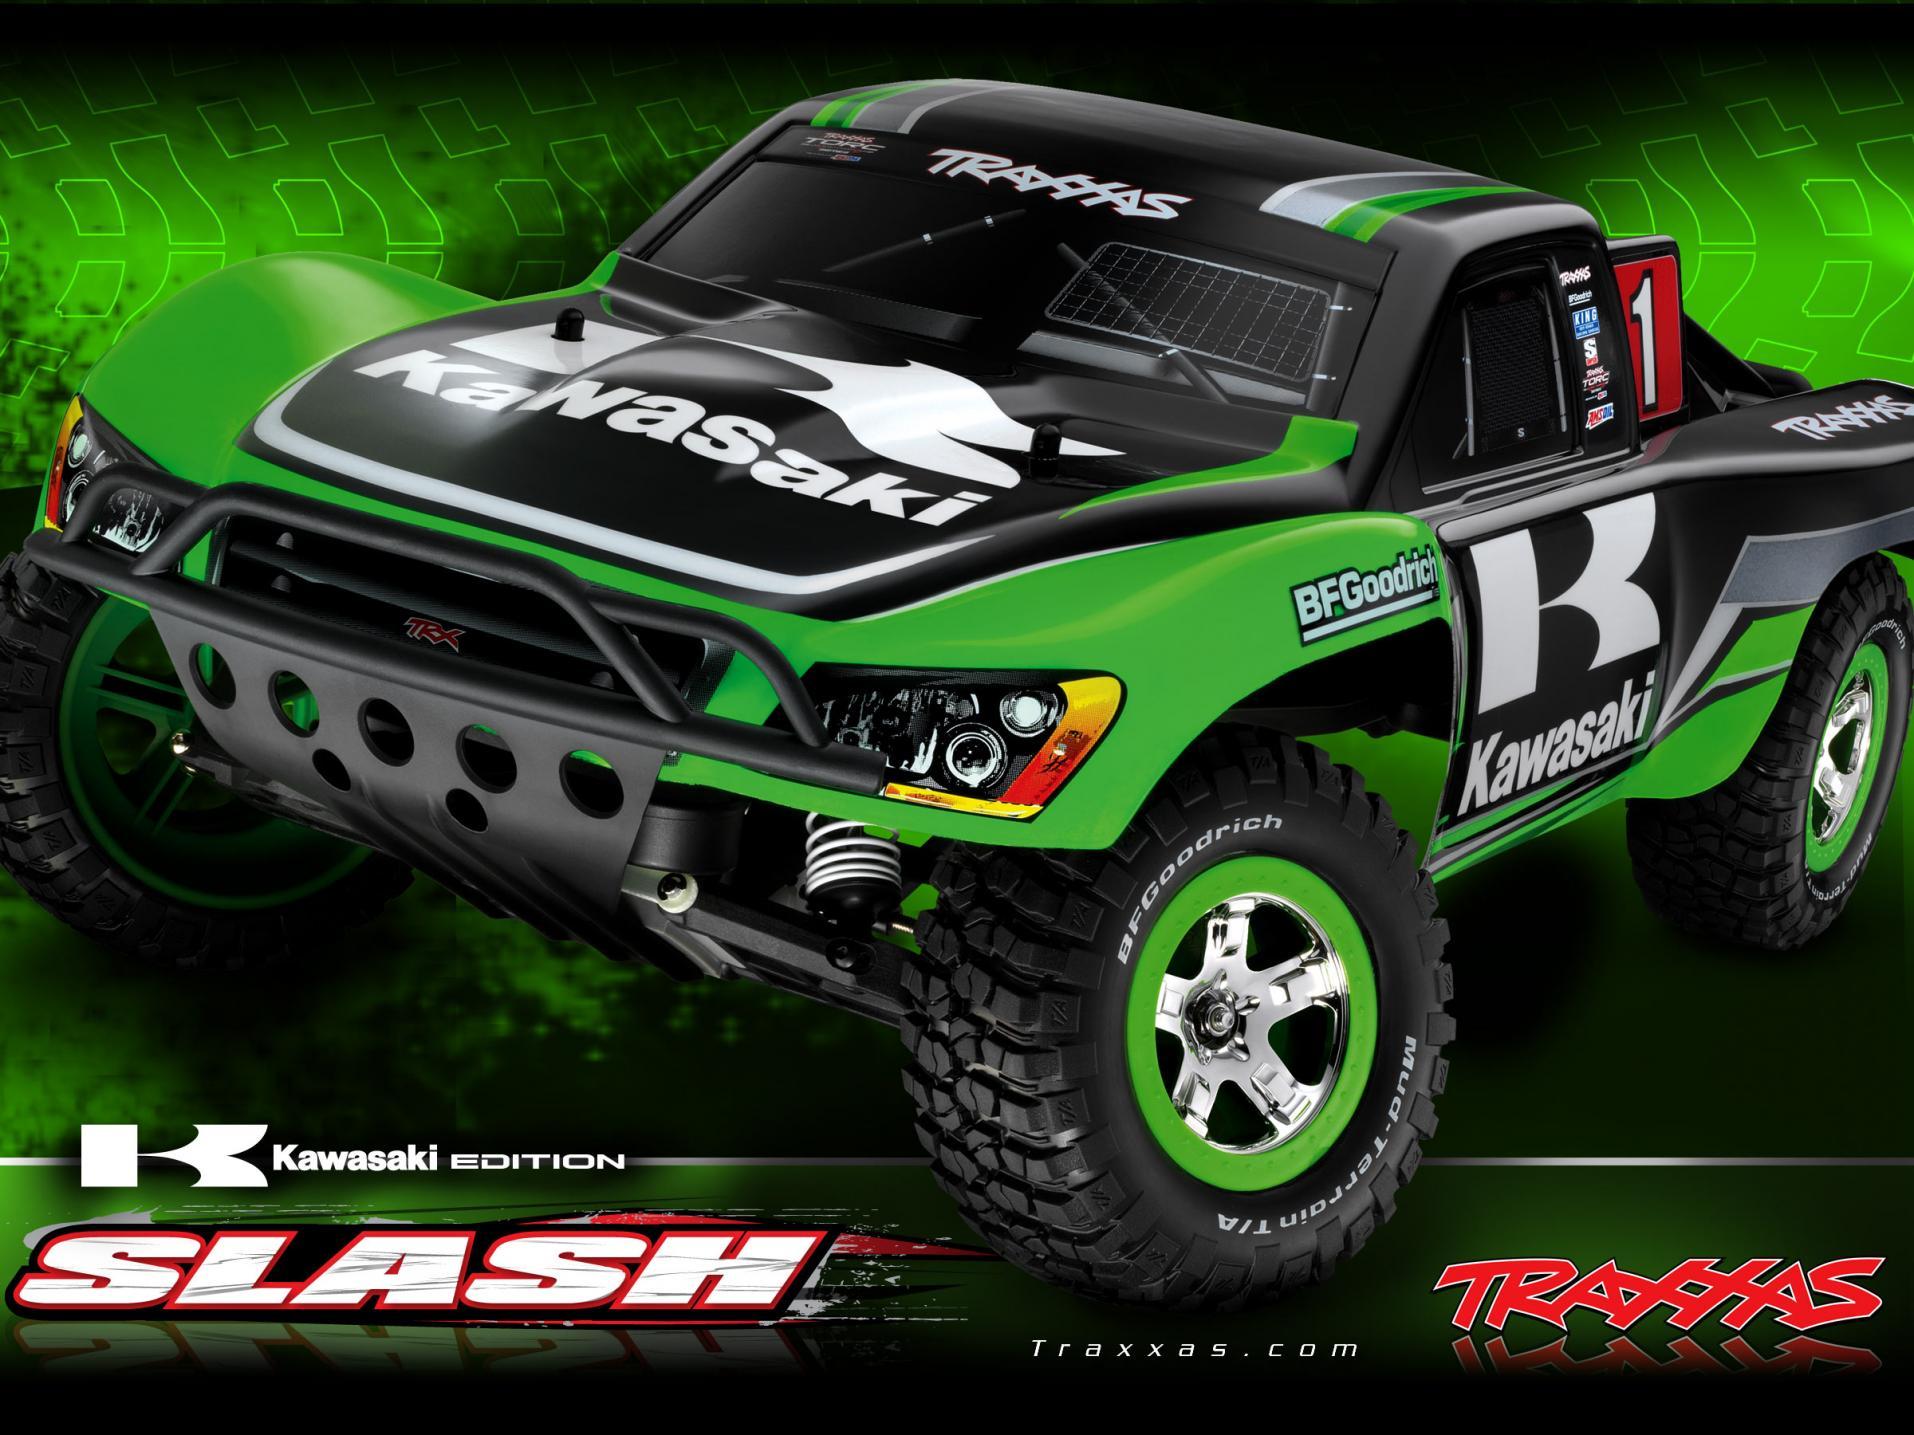 Bnib Limited Edition Kawasaki Traxxas Slash Brushed Cars R